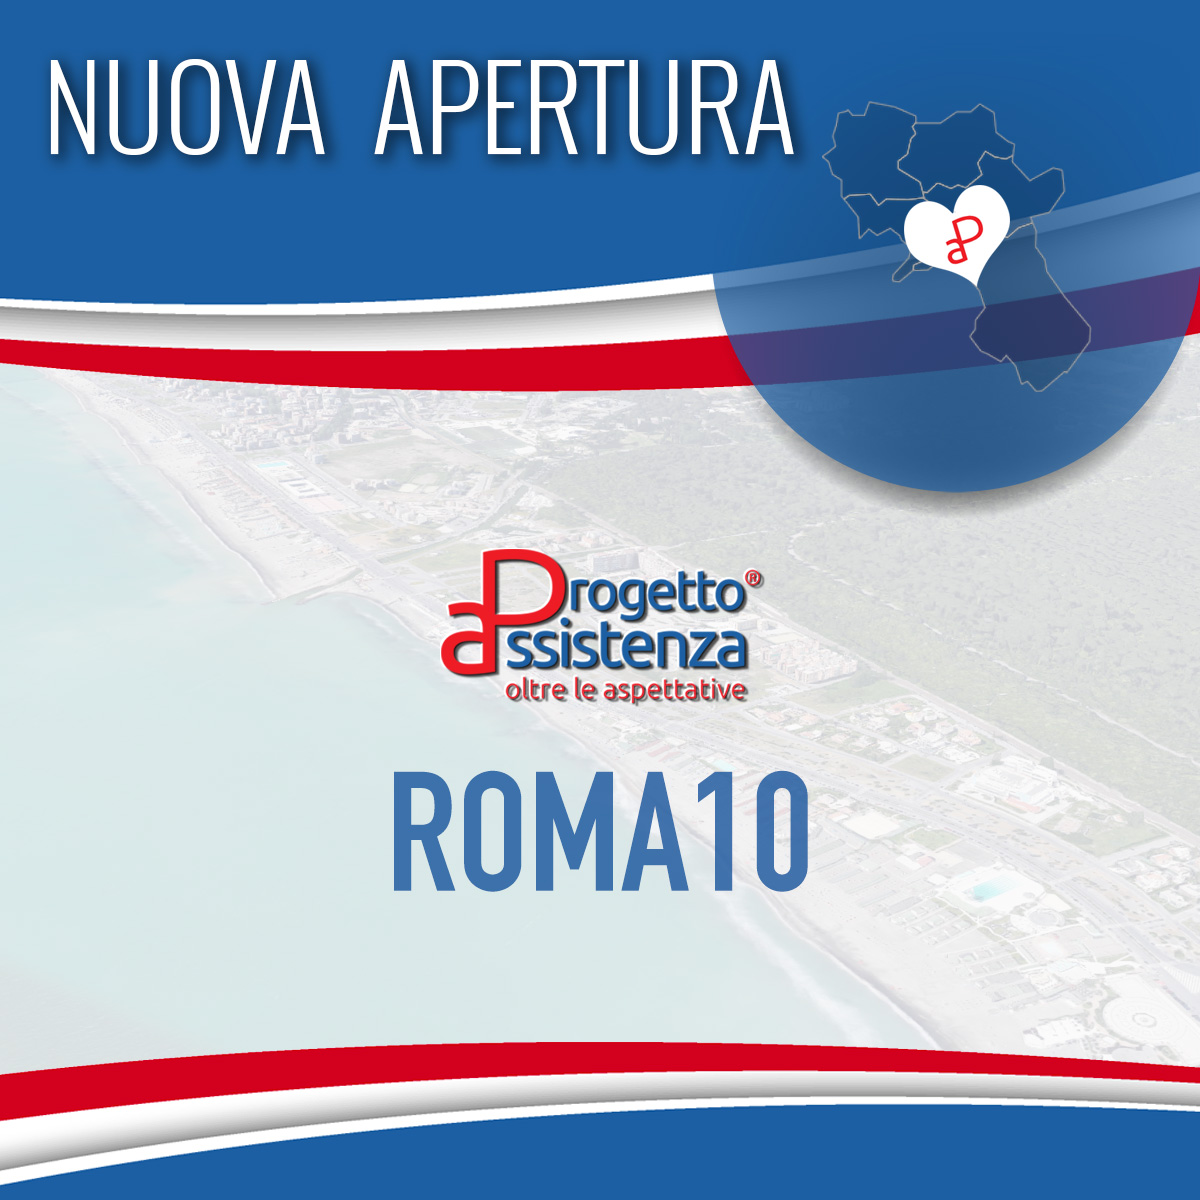 Nuova Apertura: Roma10